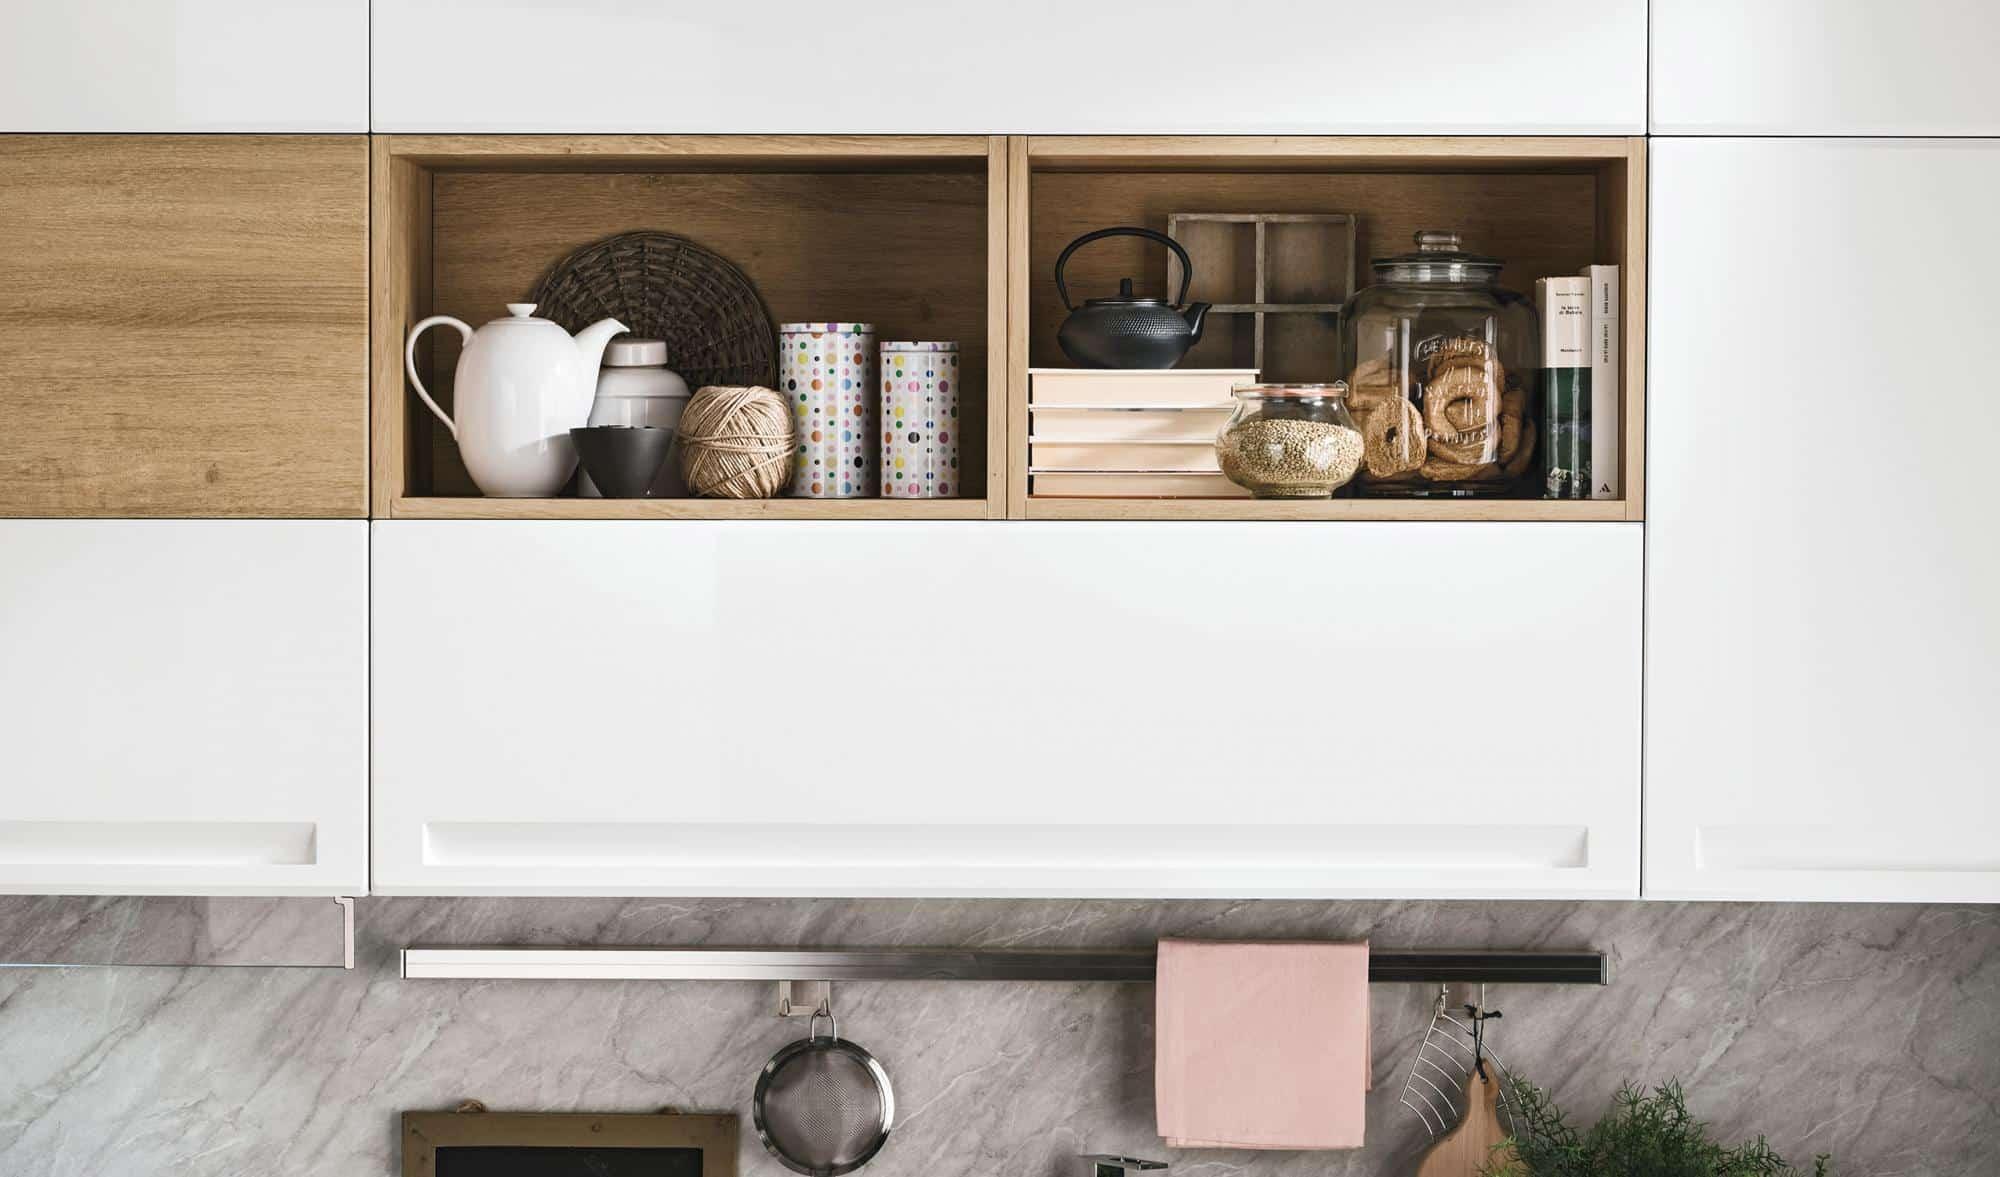 Isla κουζινα λευκό και φυσικο χρωματισμο πολυμερικο με ενσωματωμενη λαβη και ρετρο υφος λεπτομερειες